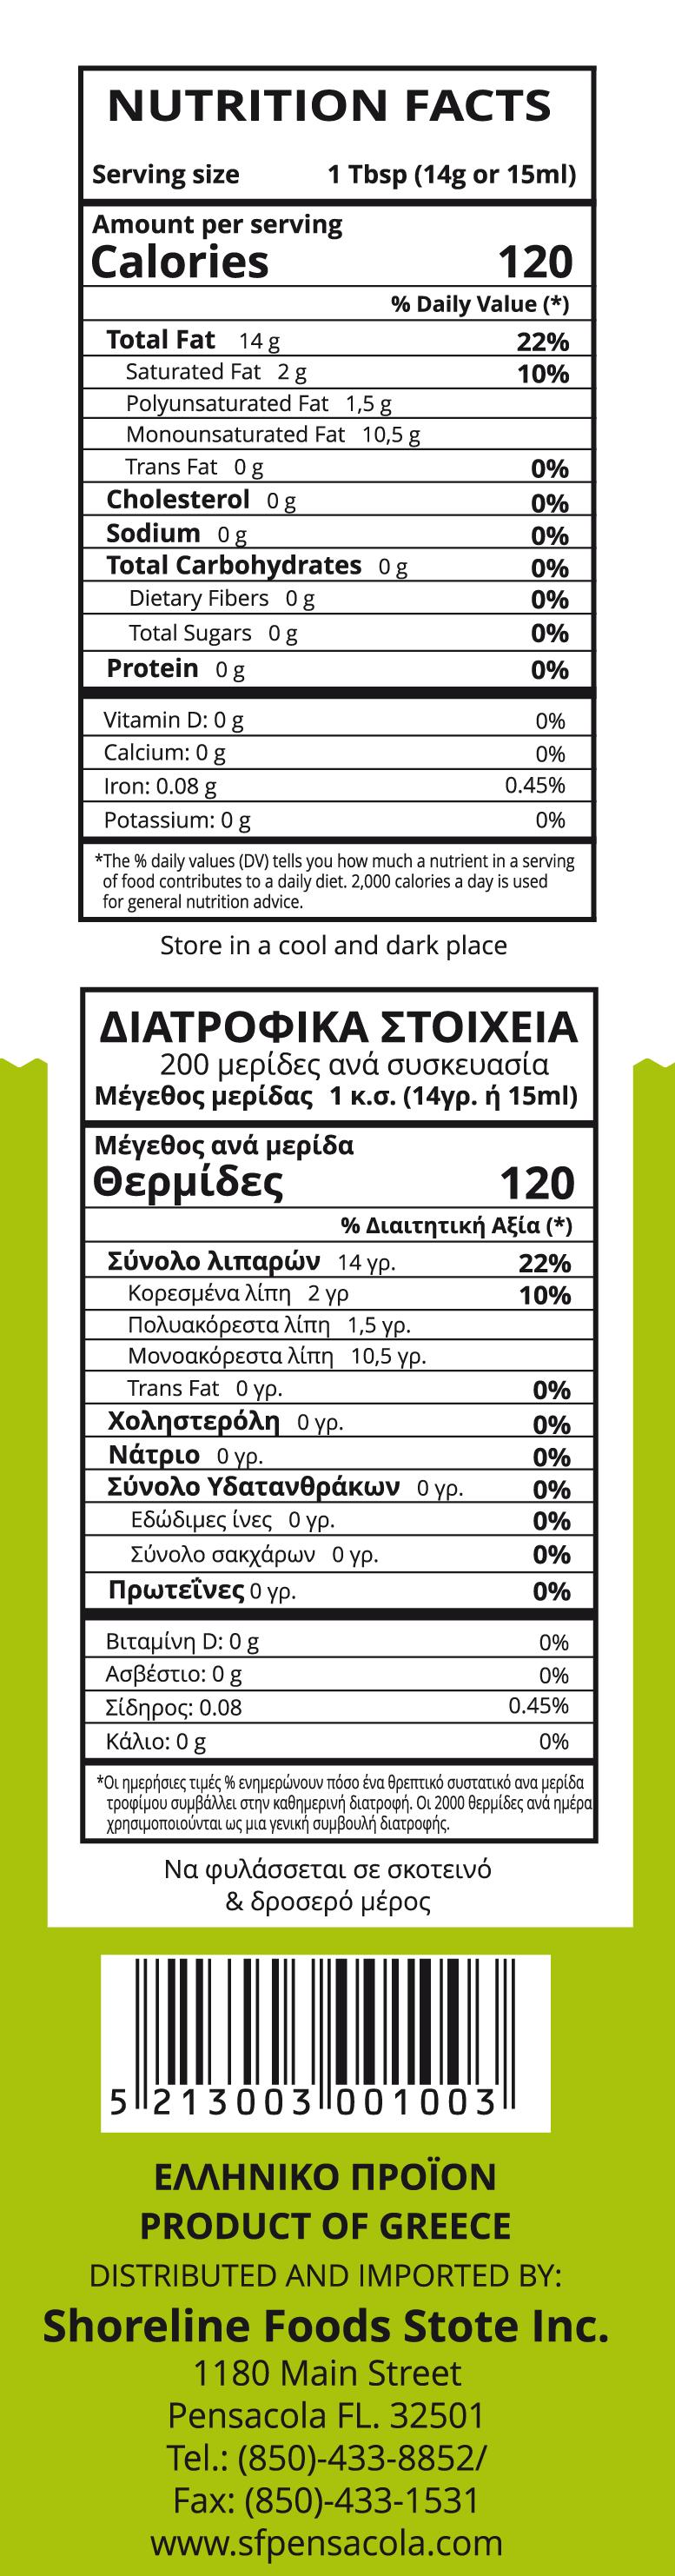 Shoreline EVOO Nutrition Facts